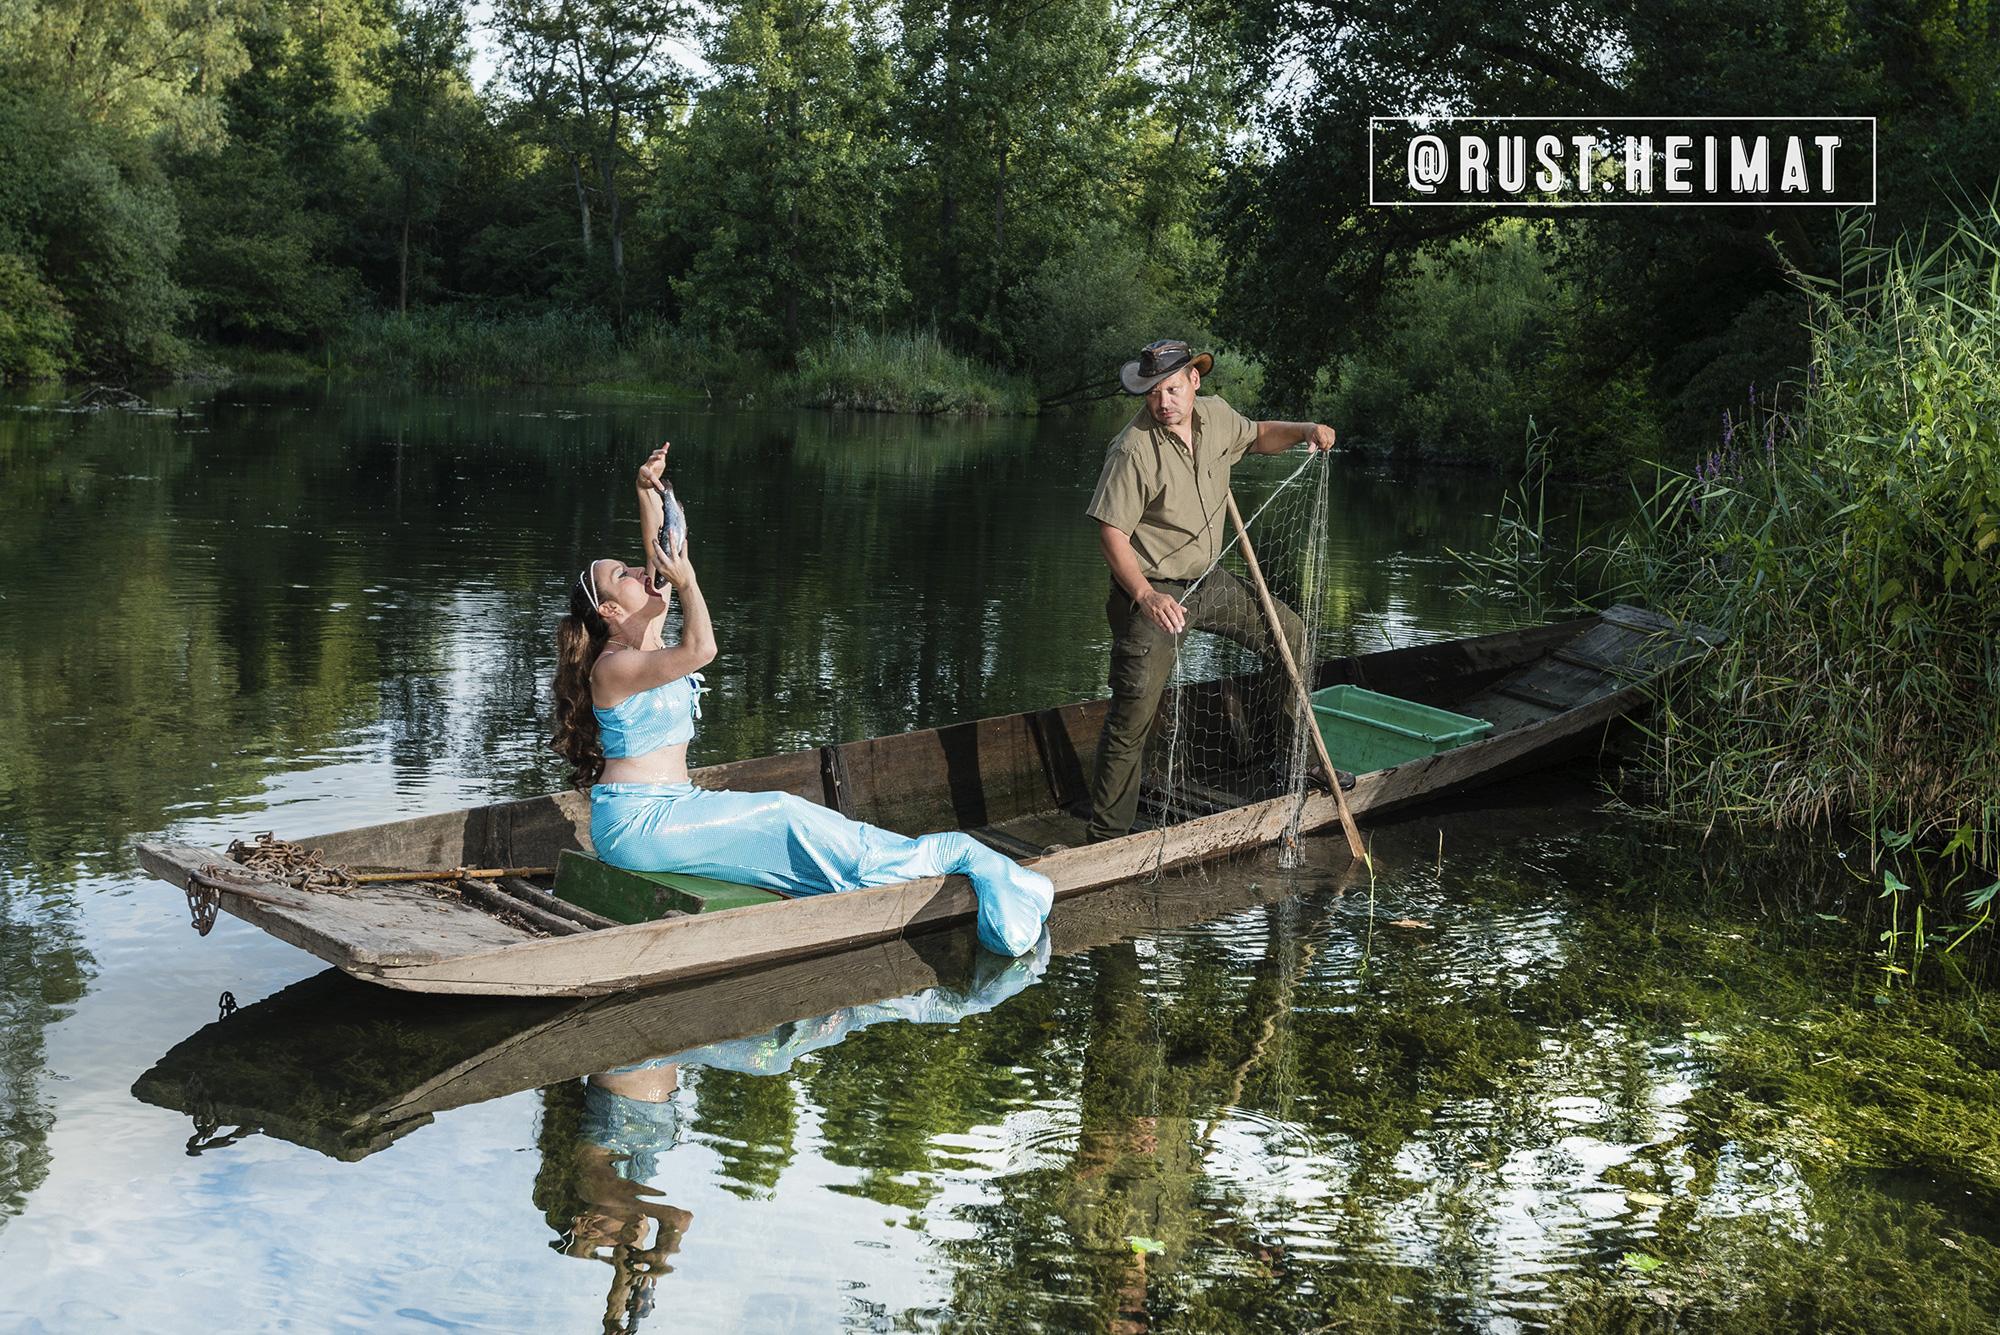 Kalenderbild Taubergiessen aus rust.heimat mit Taubergiessenjungfrau